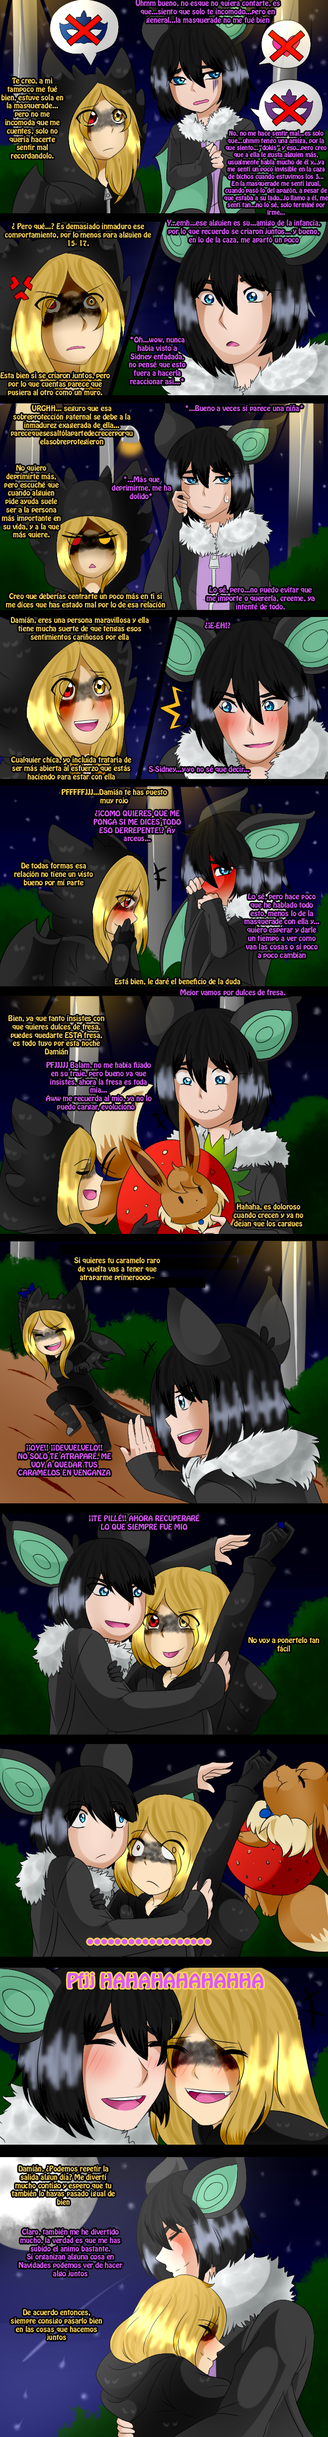 [AA2] Trick or Treat - Sidney + Damian by Koyukistyle